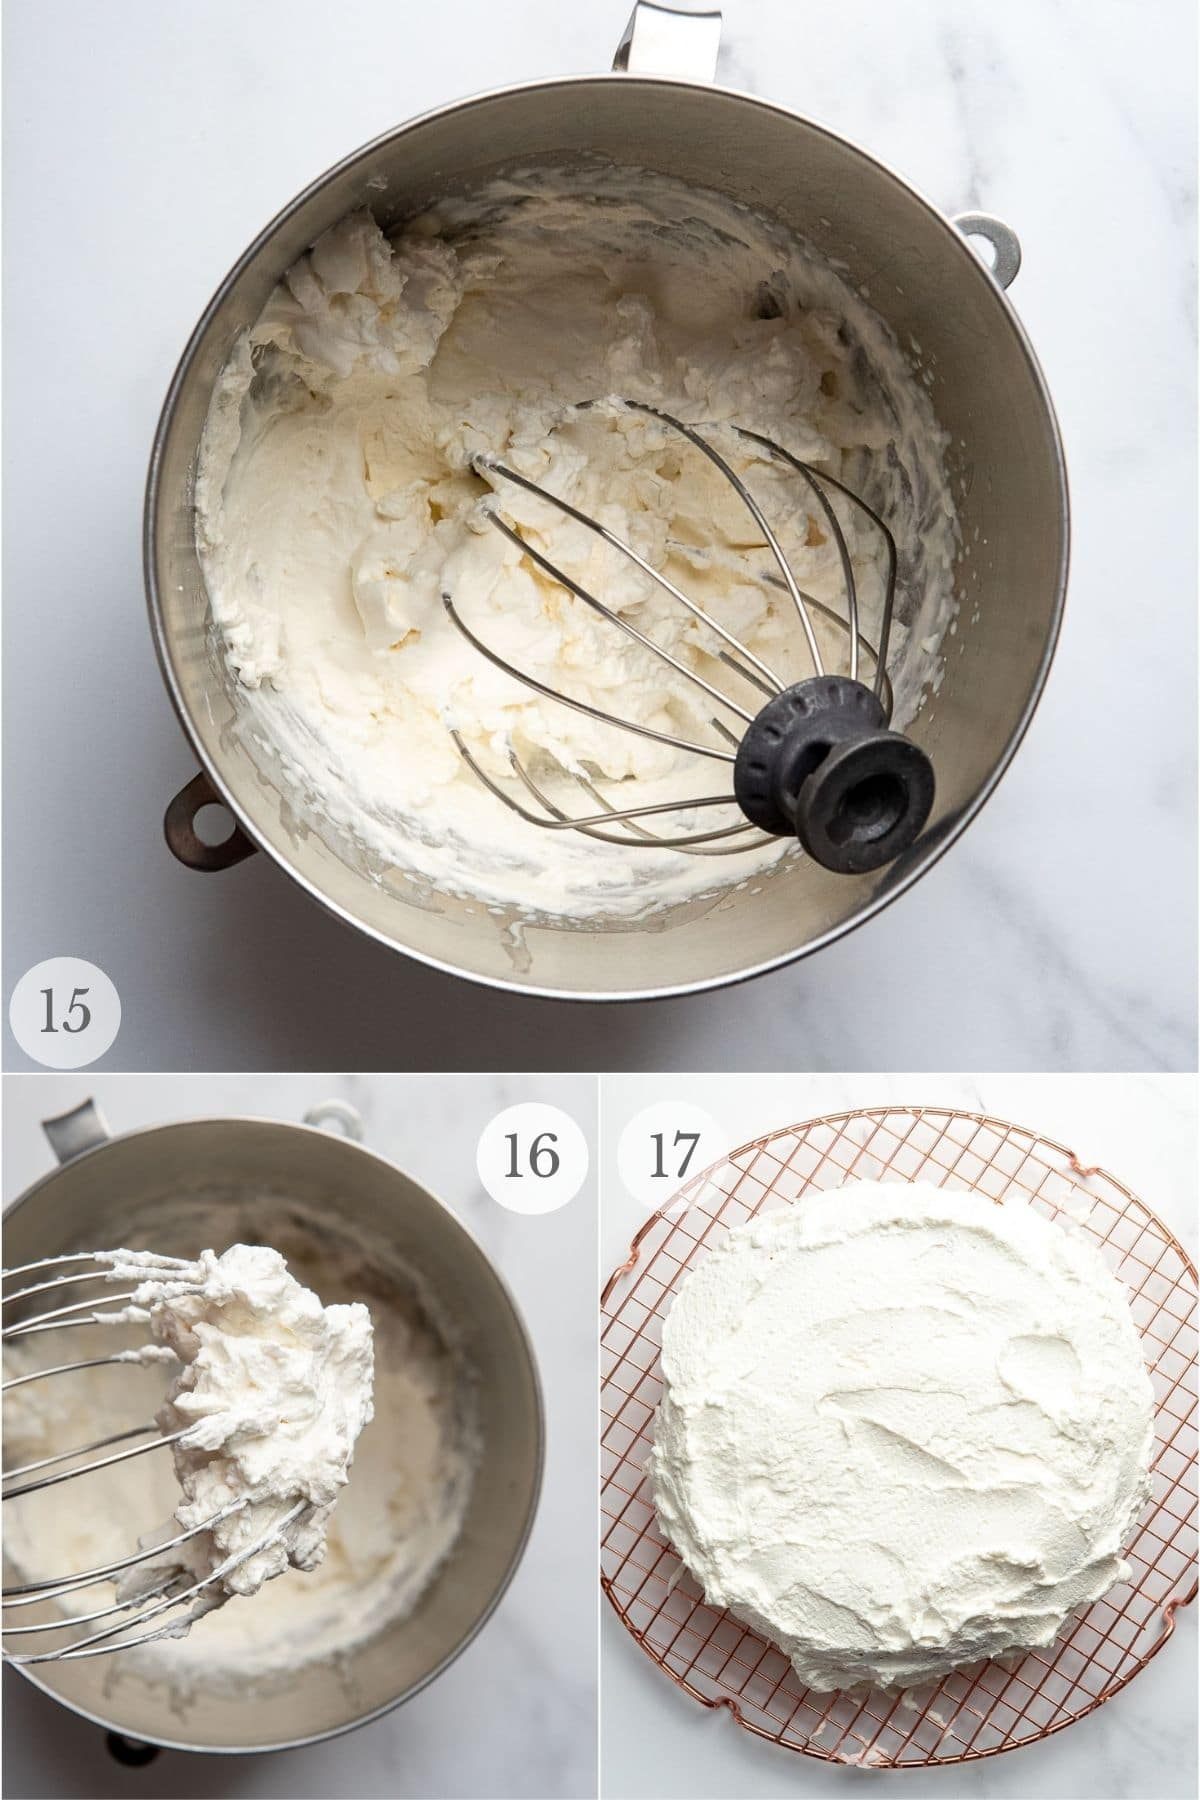 tres leches cake recipe steps 15-17